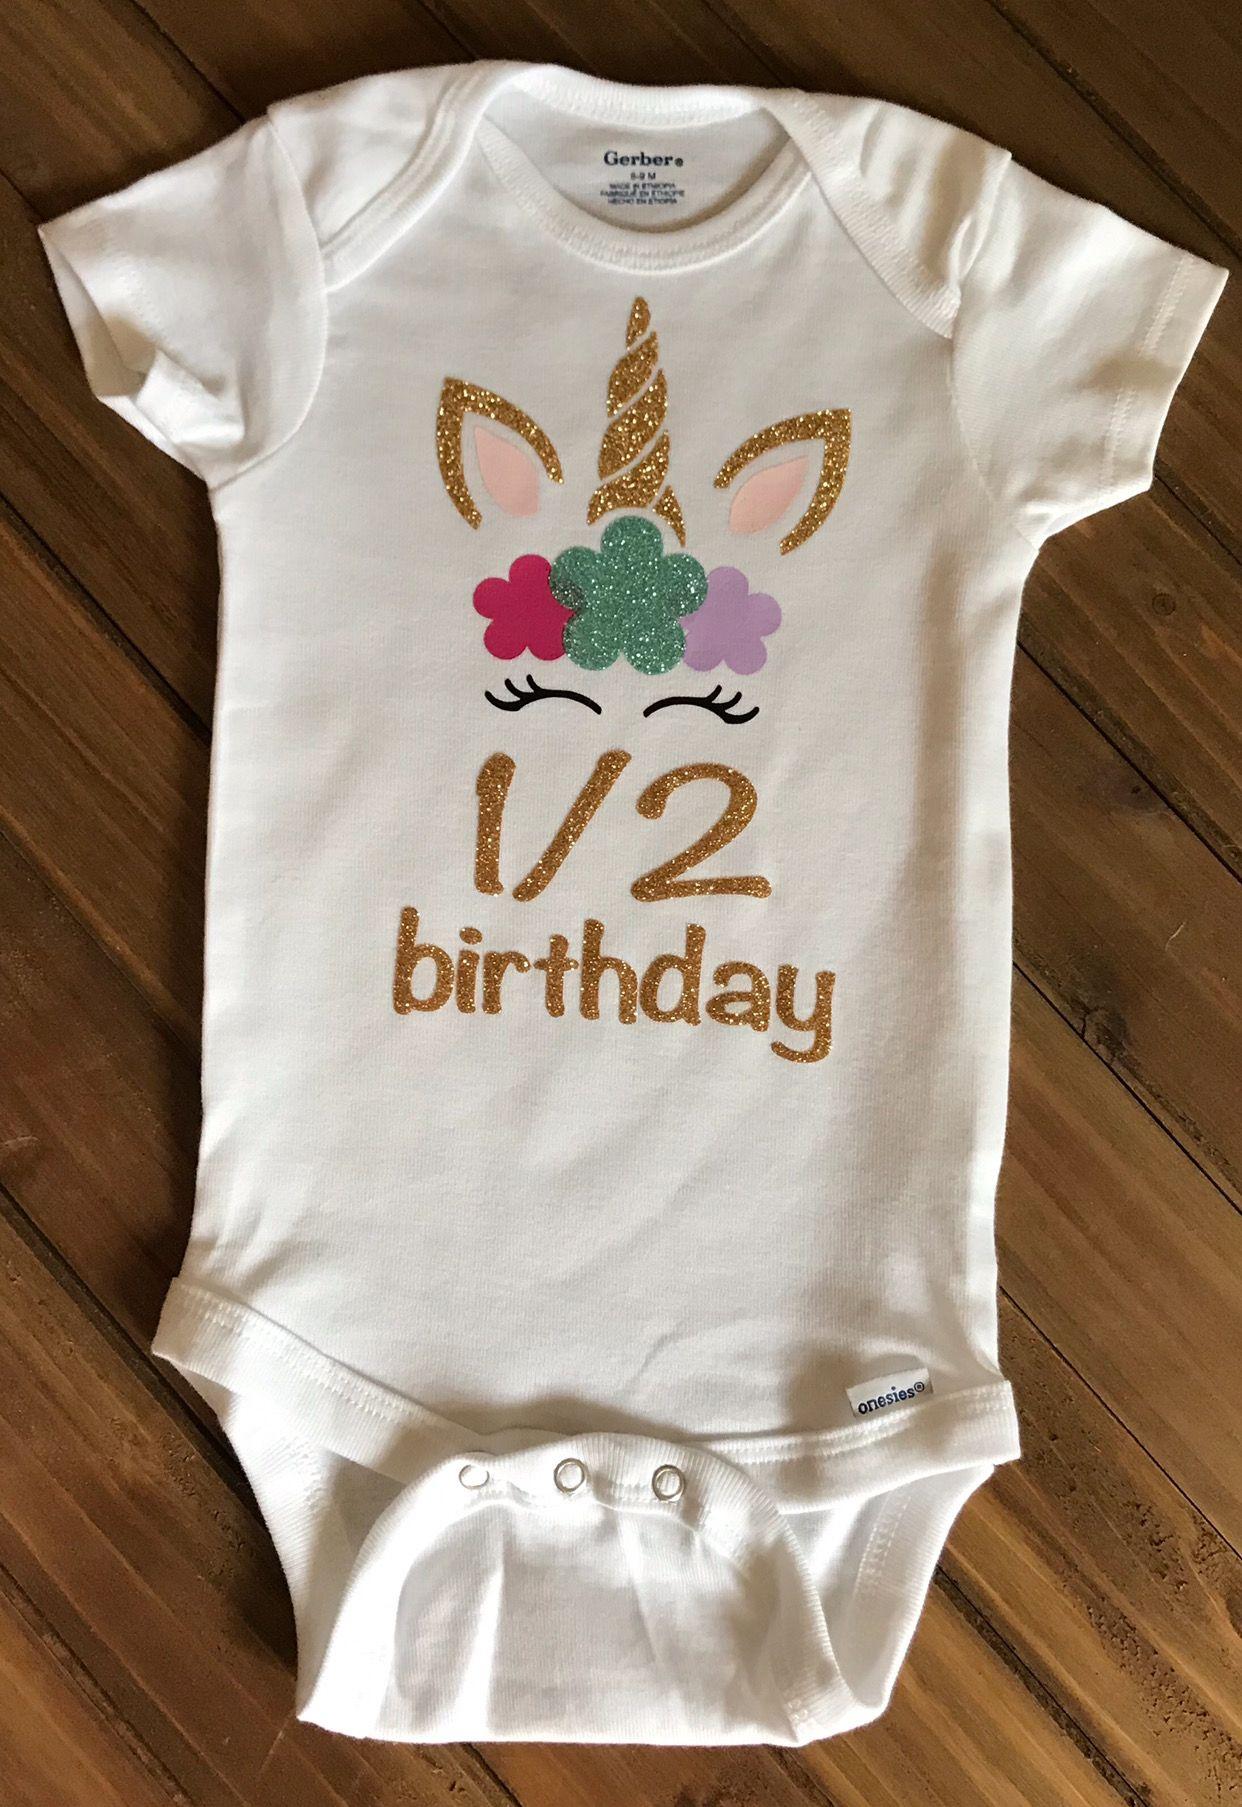 Gift for 1 Year Old Baby Girl 1st Birthday Gift Unicorn Infant Kids T-Shirt